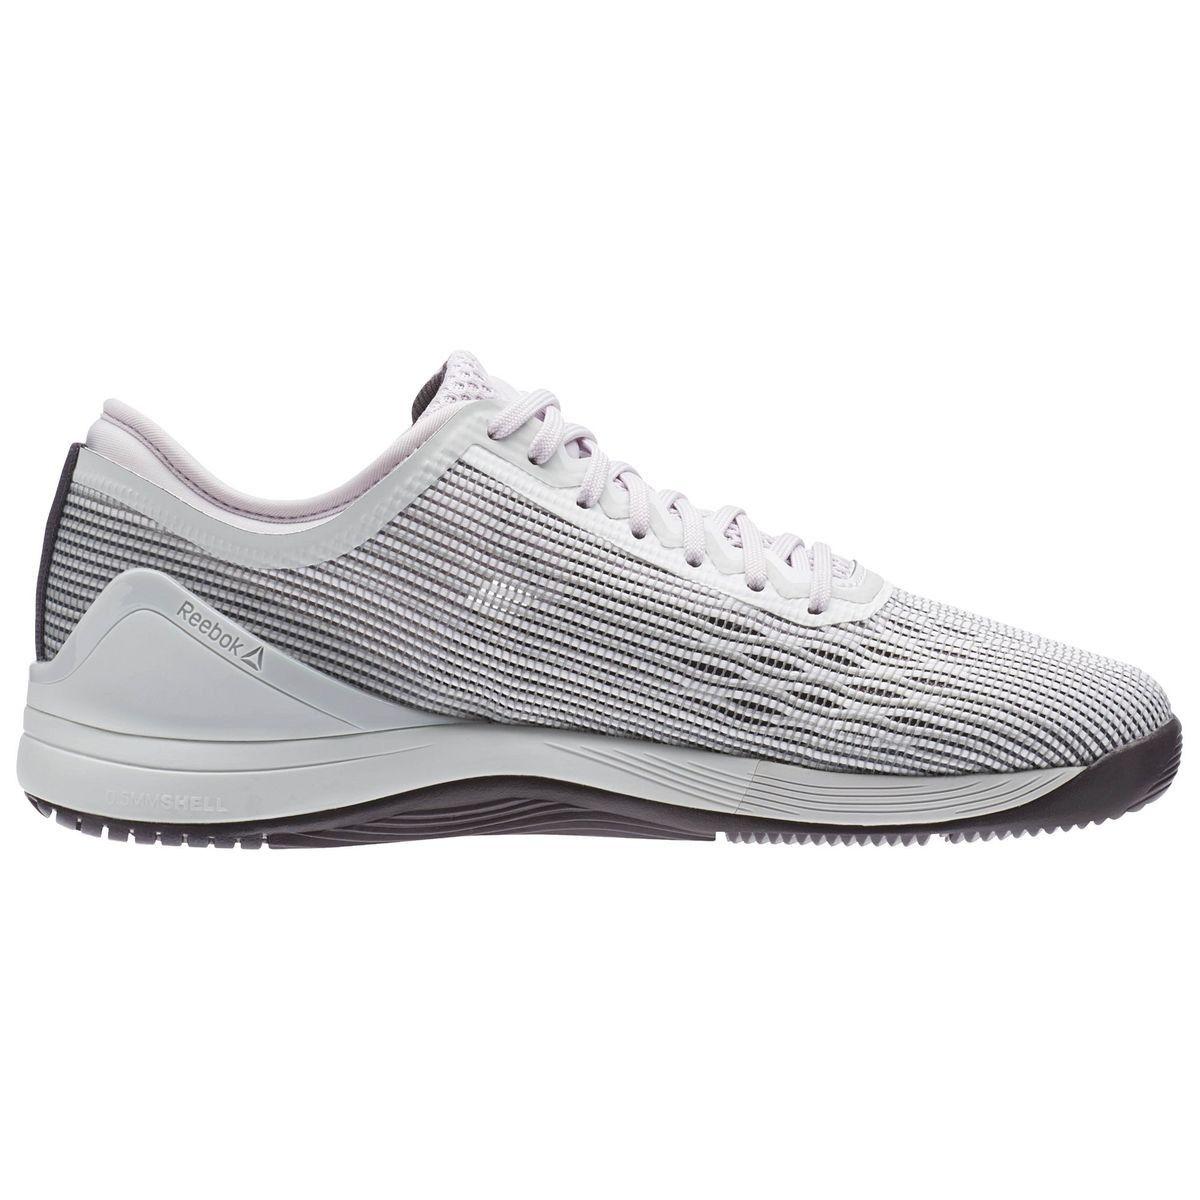 crossfit chaussure nike